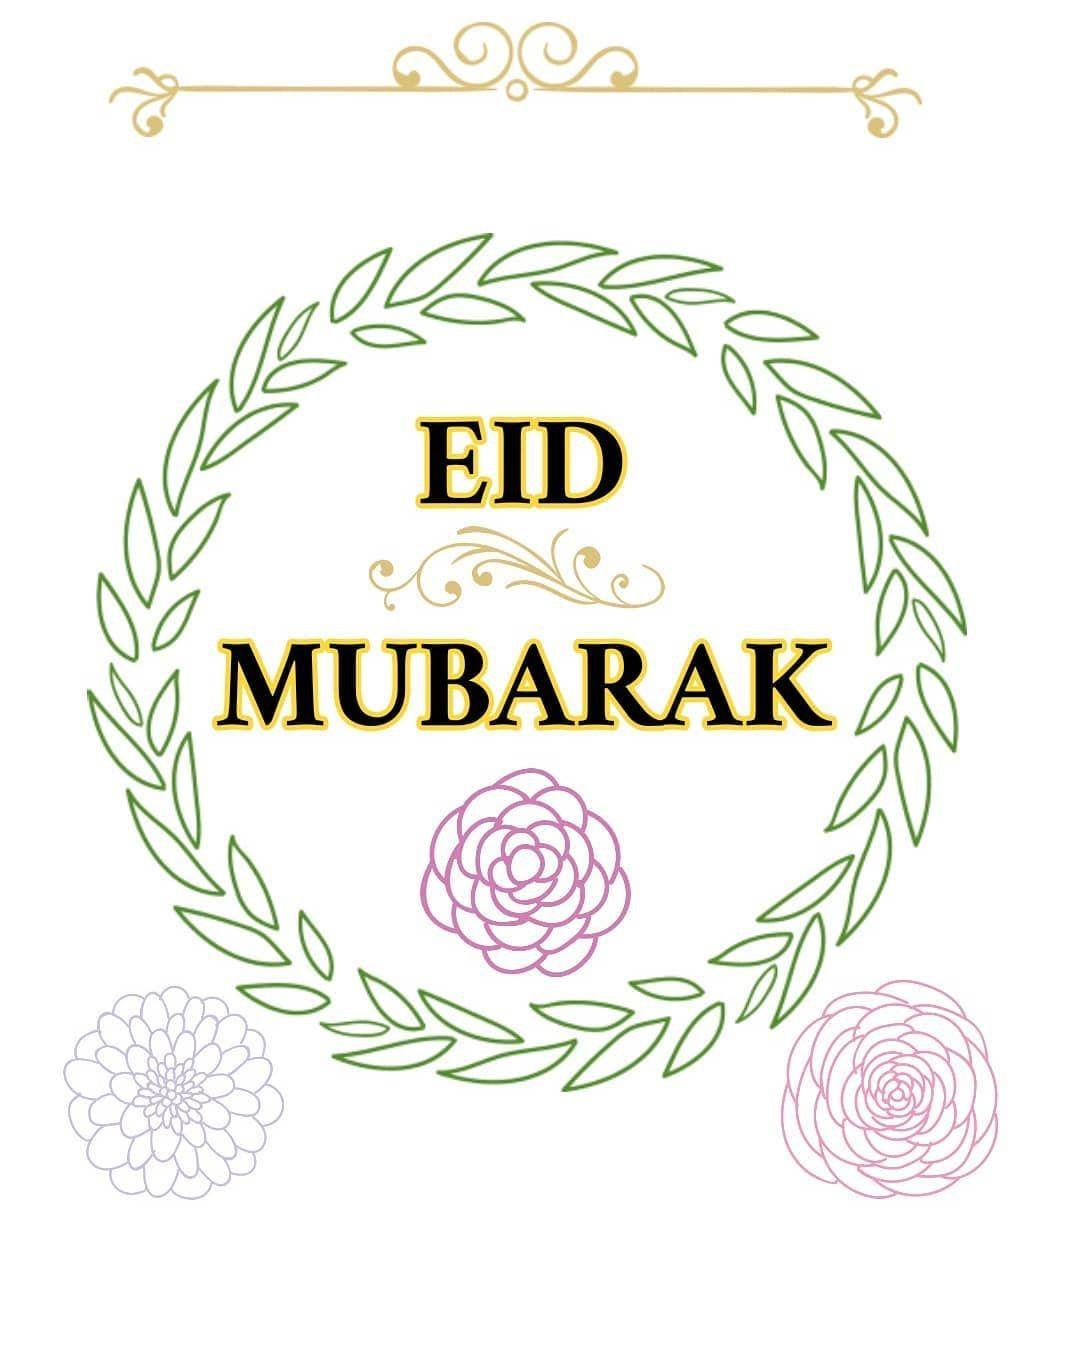 Pin By Ofelia Bashirian On Eid Eid Mubarak Eid Possitive Quotes